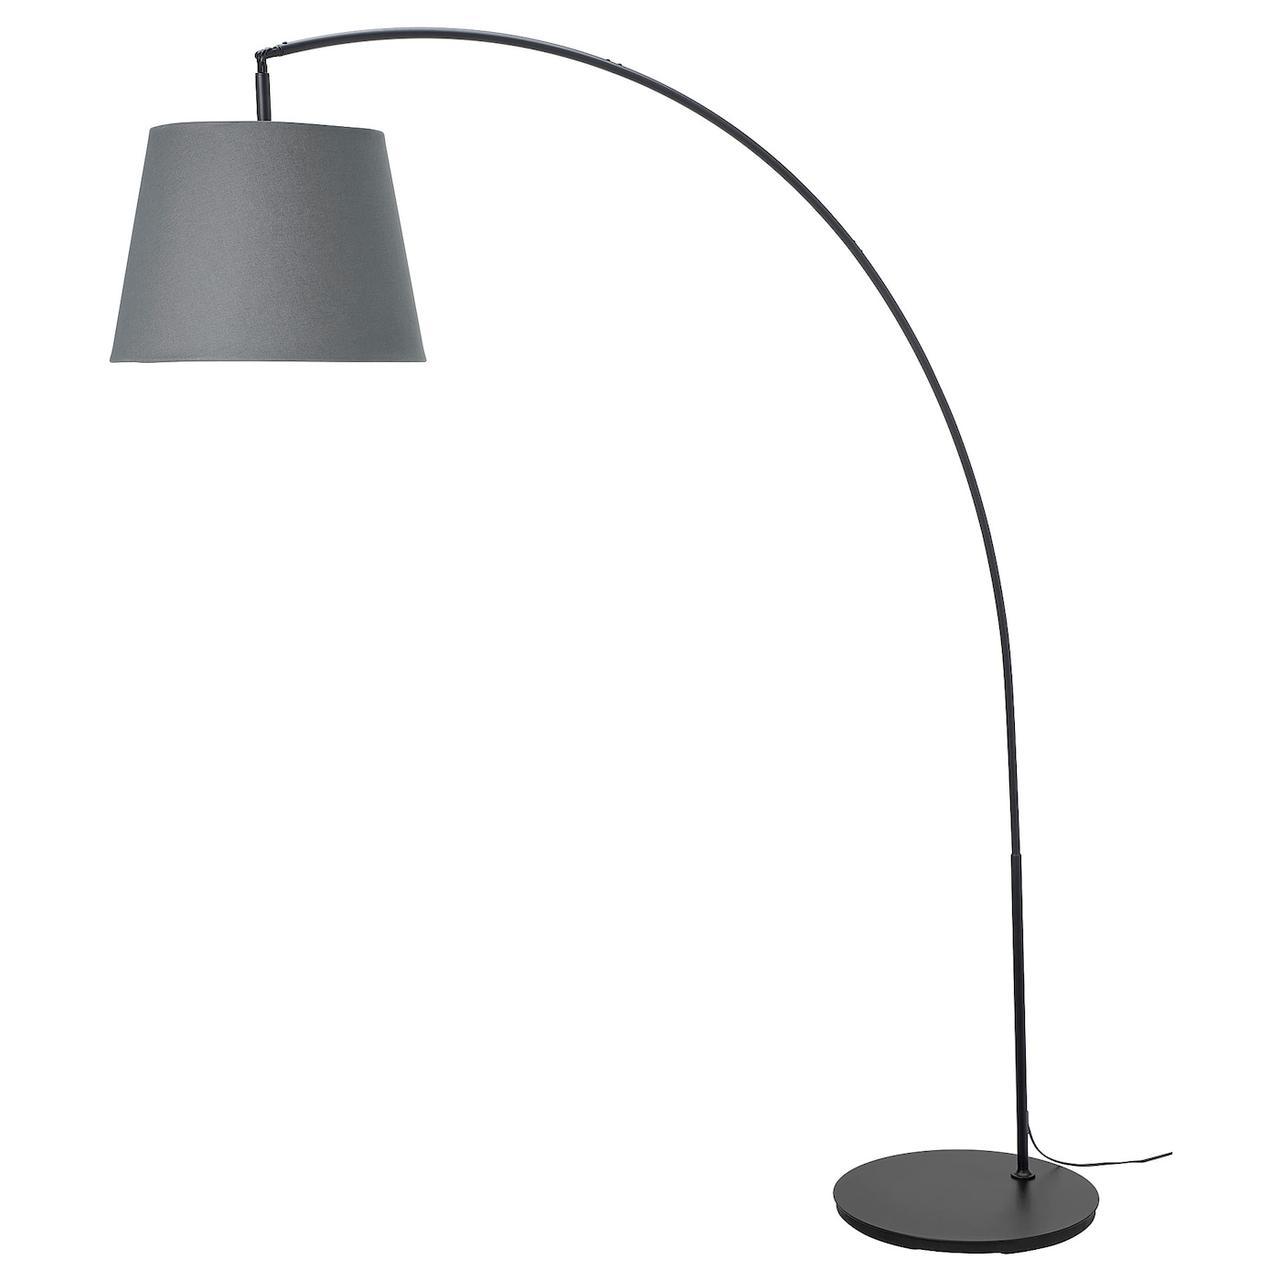 IKEA SKOTTORP / SKAFTET (693.859.86) Торшер дугоподібний